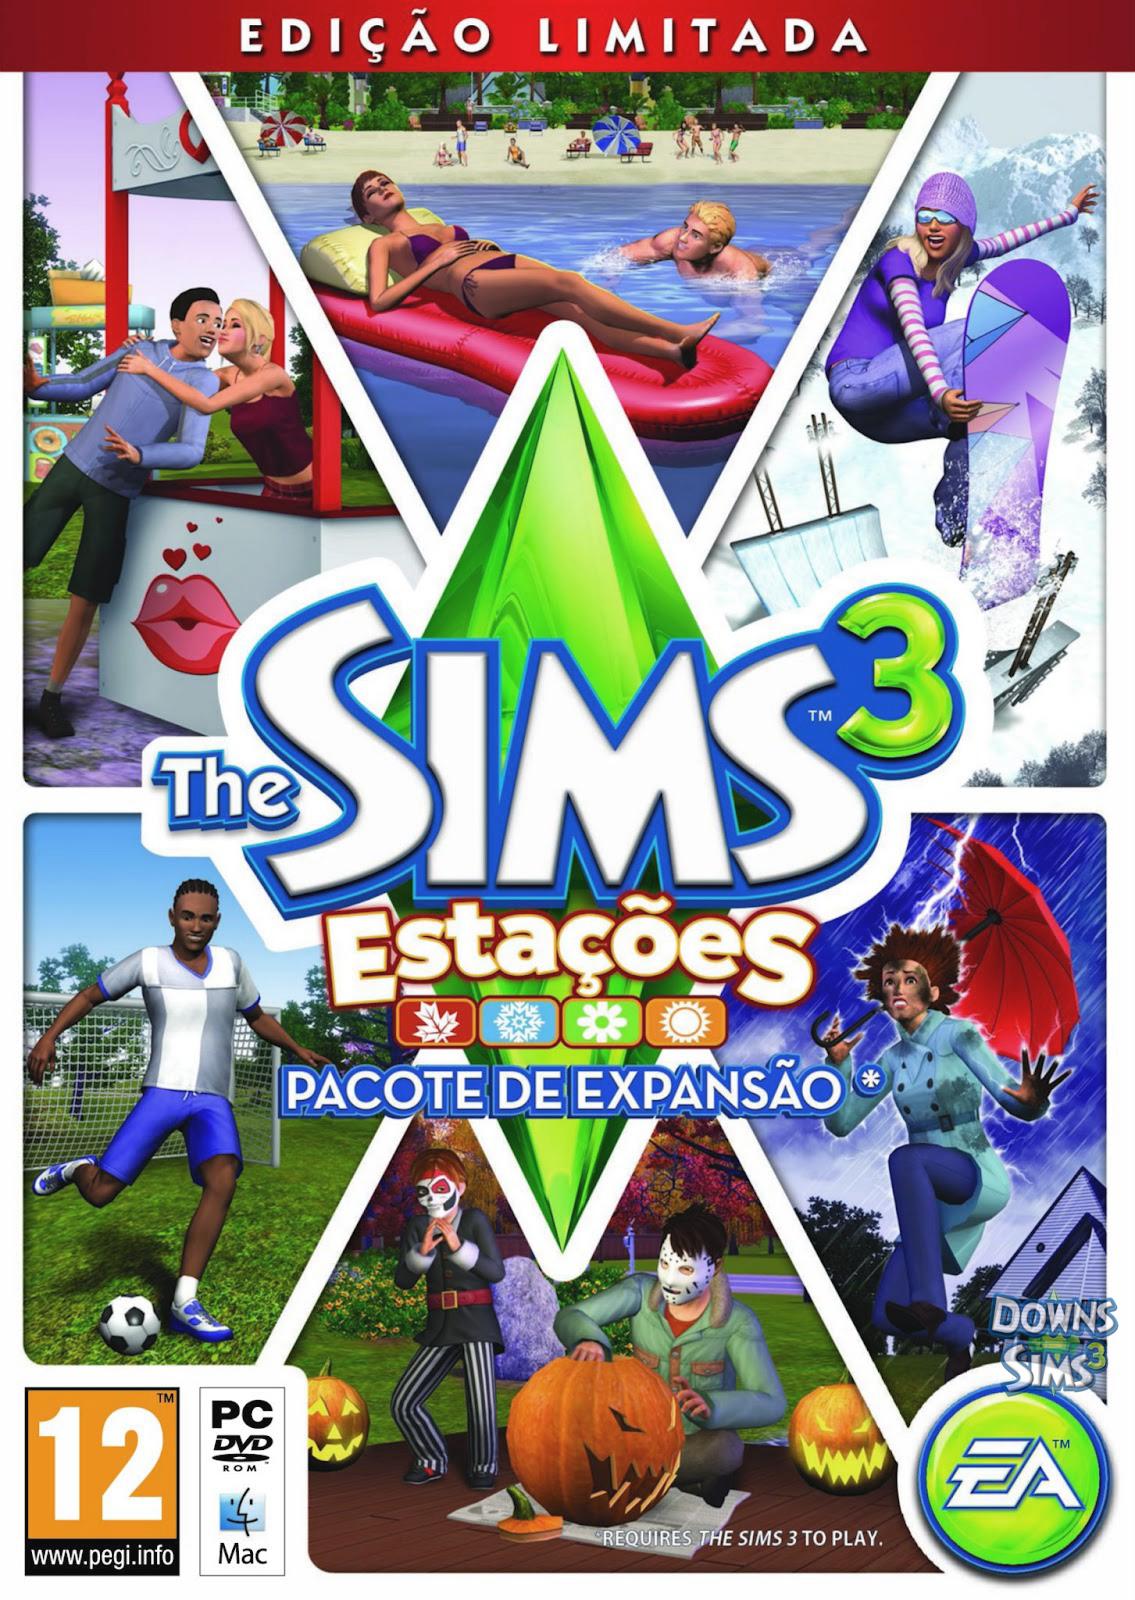 Télécharger the sims 2 pc completo portugues